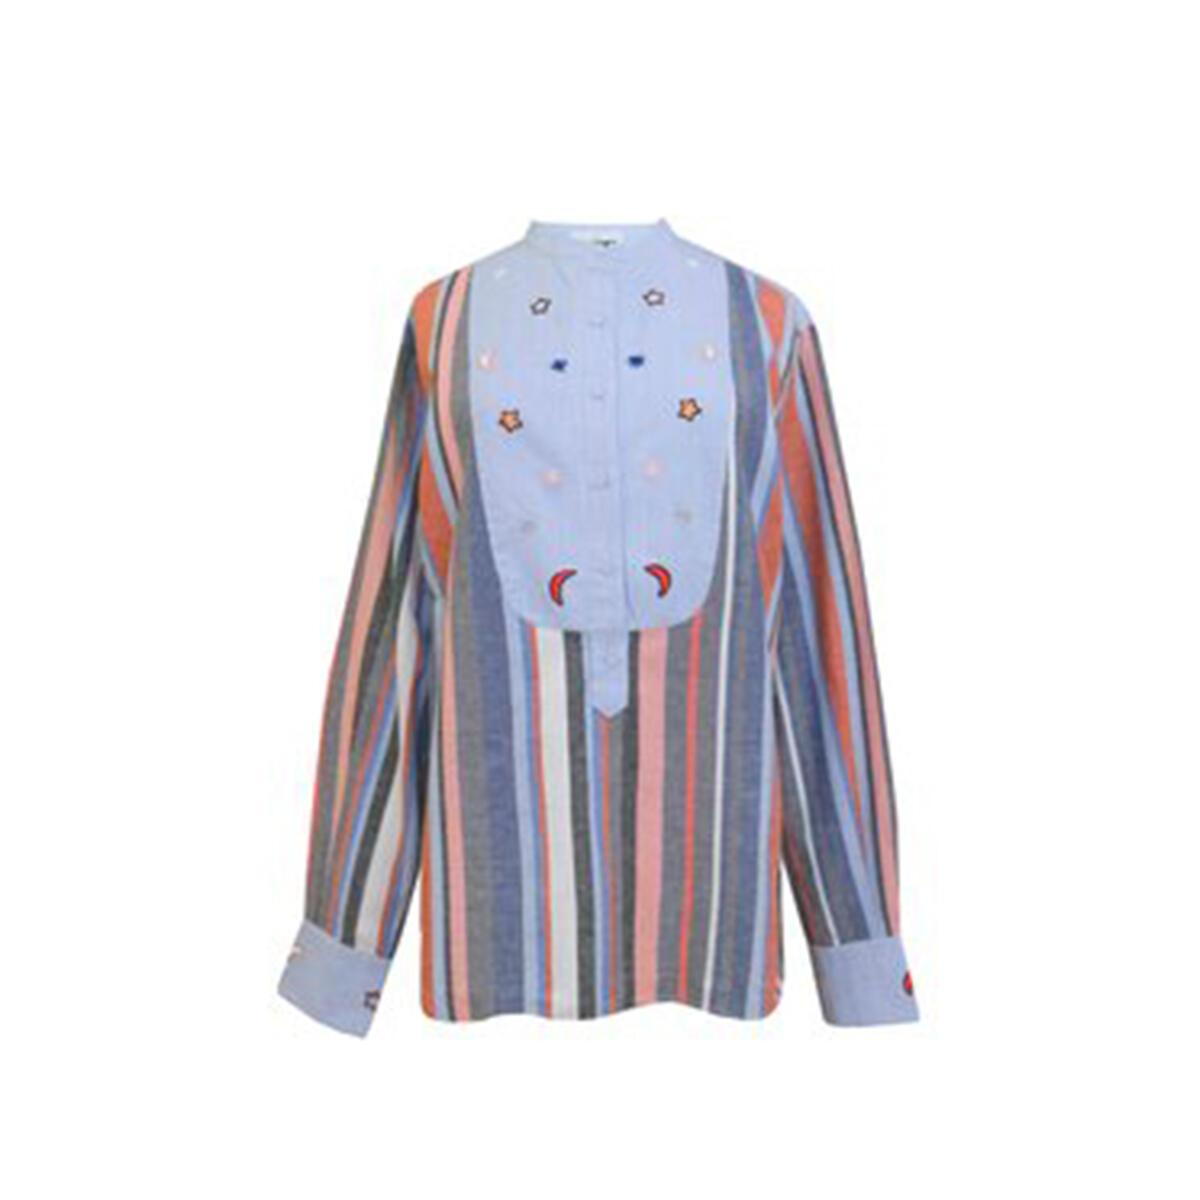 Shirt – Salmon/Grey